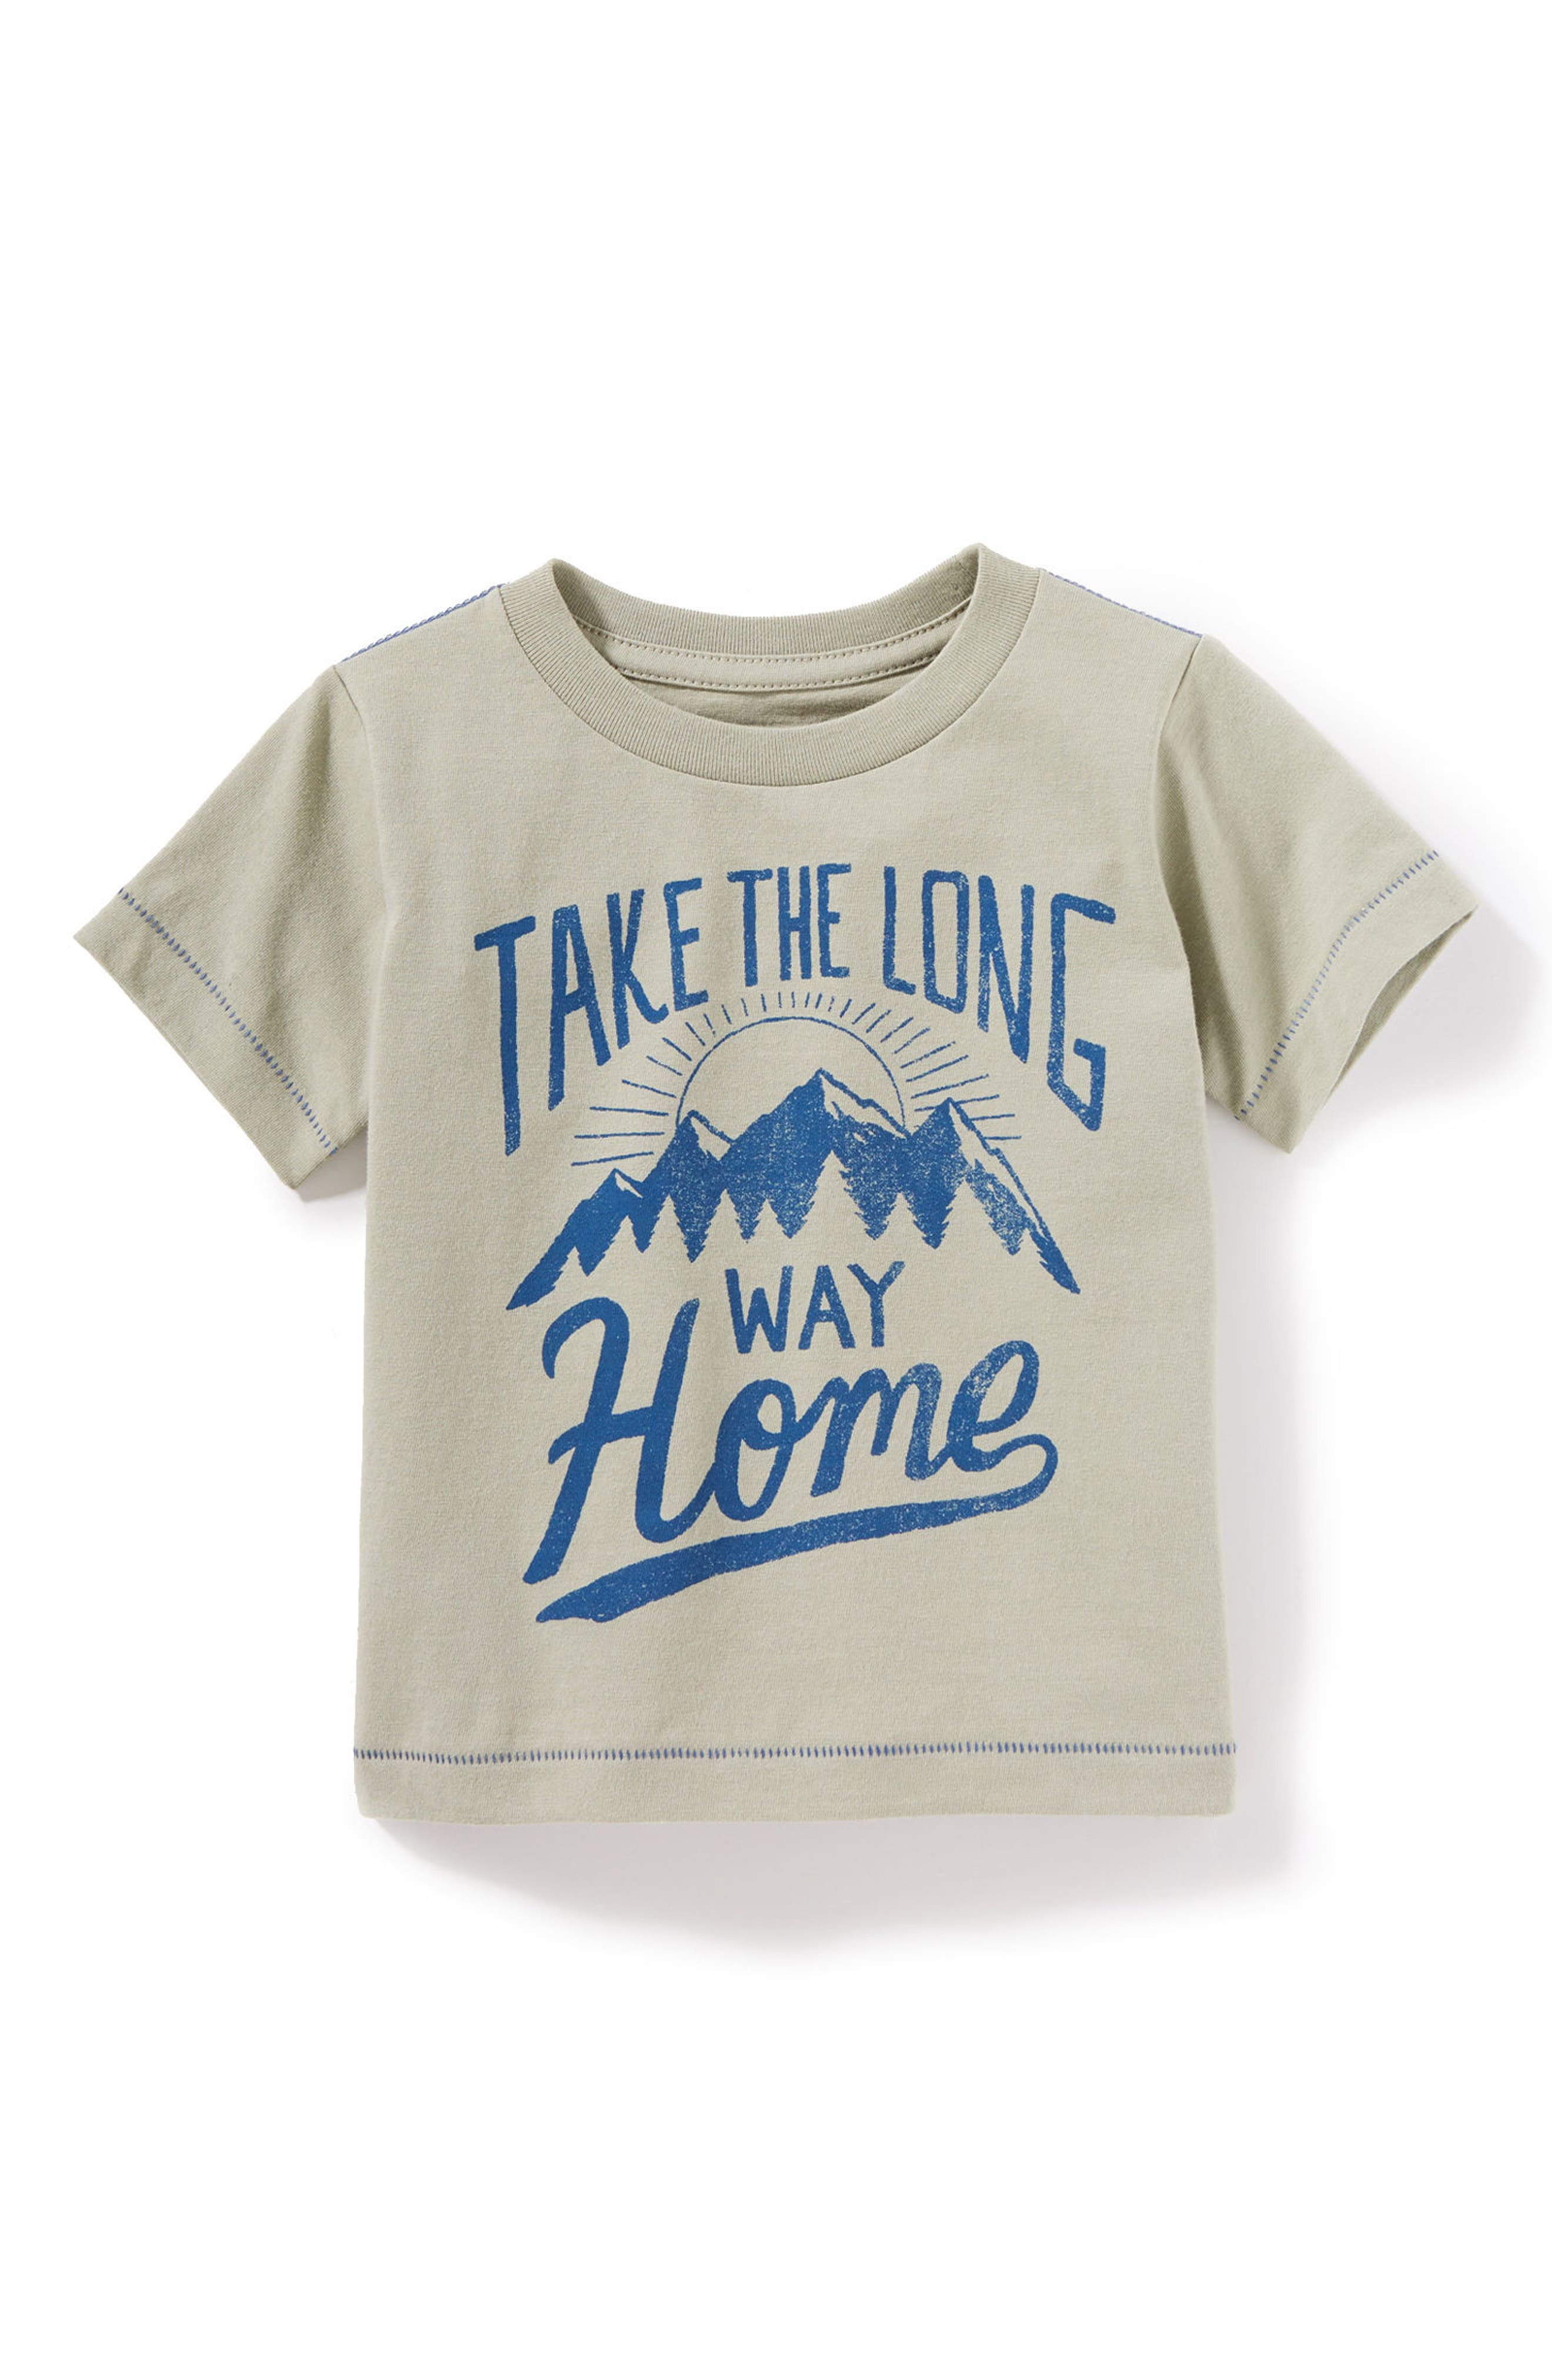 Main Image - Peek Take the Long Way Home Graphic T-Shirt (Baby Boys)